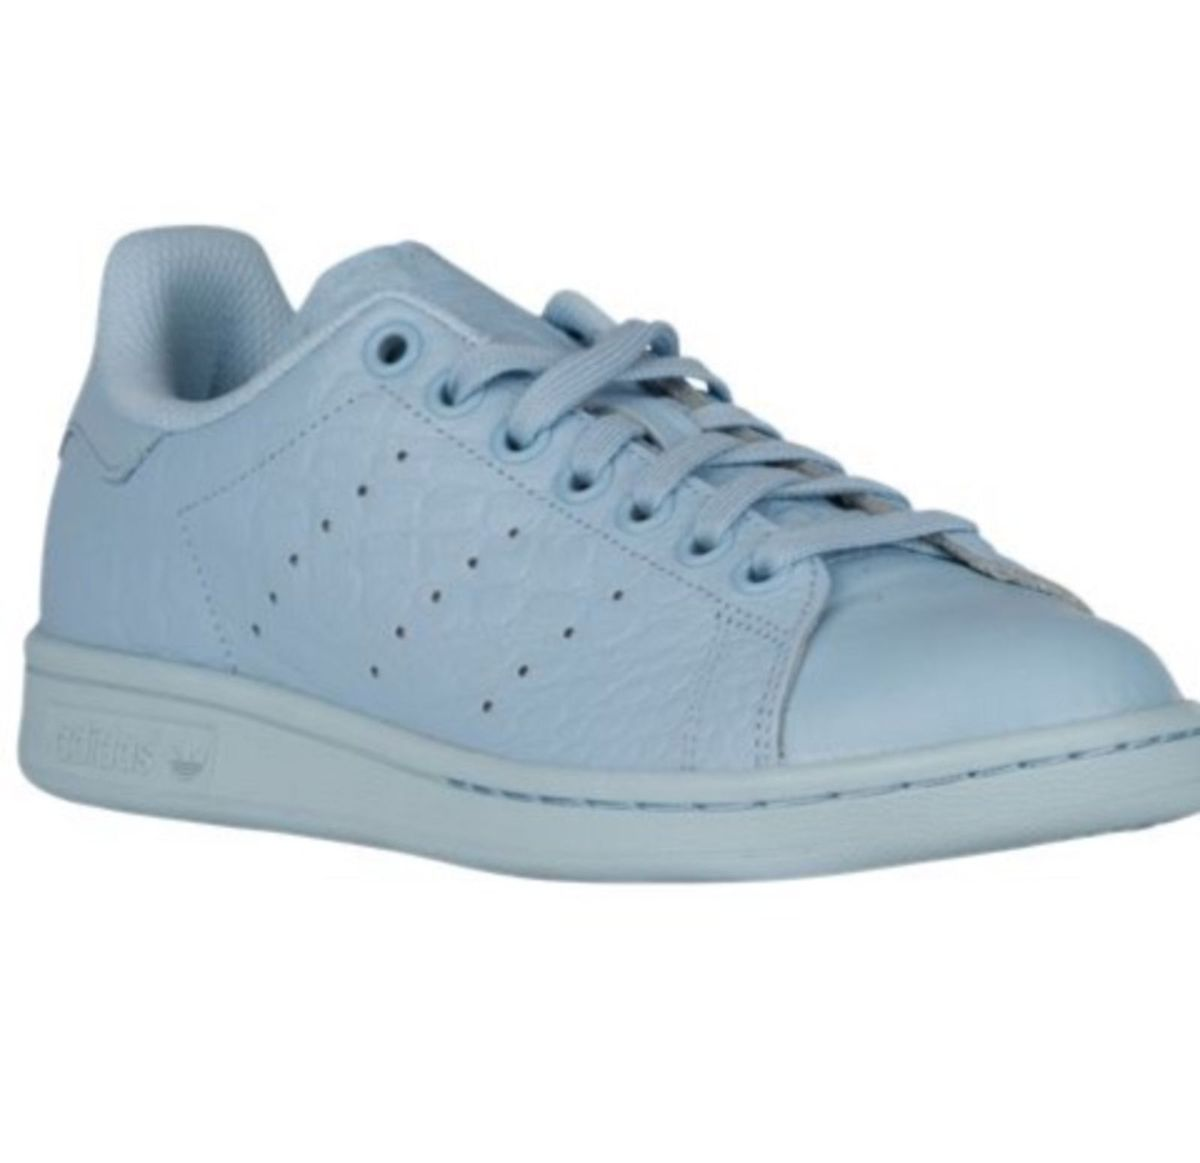 7495c567d7f tenis sam smith - tênis adidas.  Czm6ly9wag90b3muzw5qb2vplmnvbs5ici9wcm9kdwn0cy8xntkyotivmdi4otmwyjg3njc1mjzmnzc0zgriytm0ota3zdjmmtuuanbn  ...